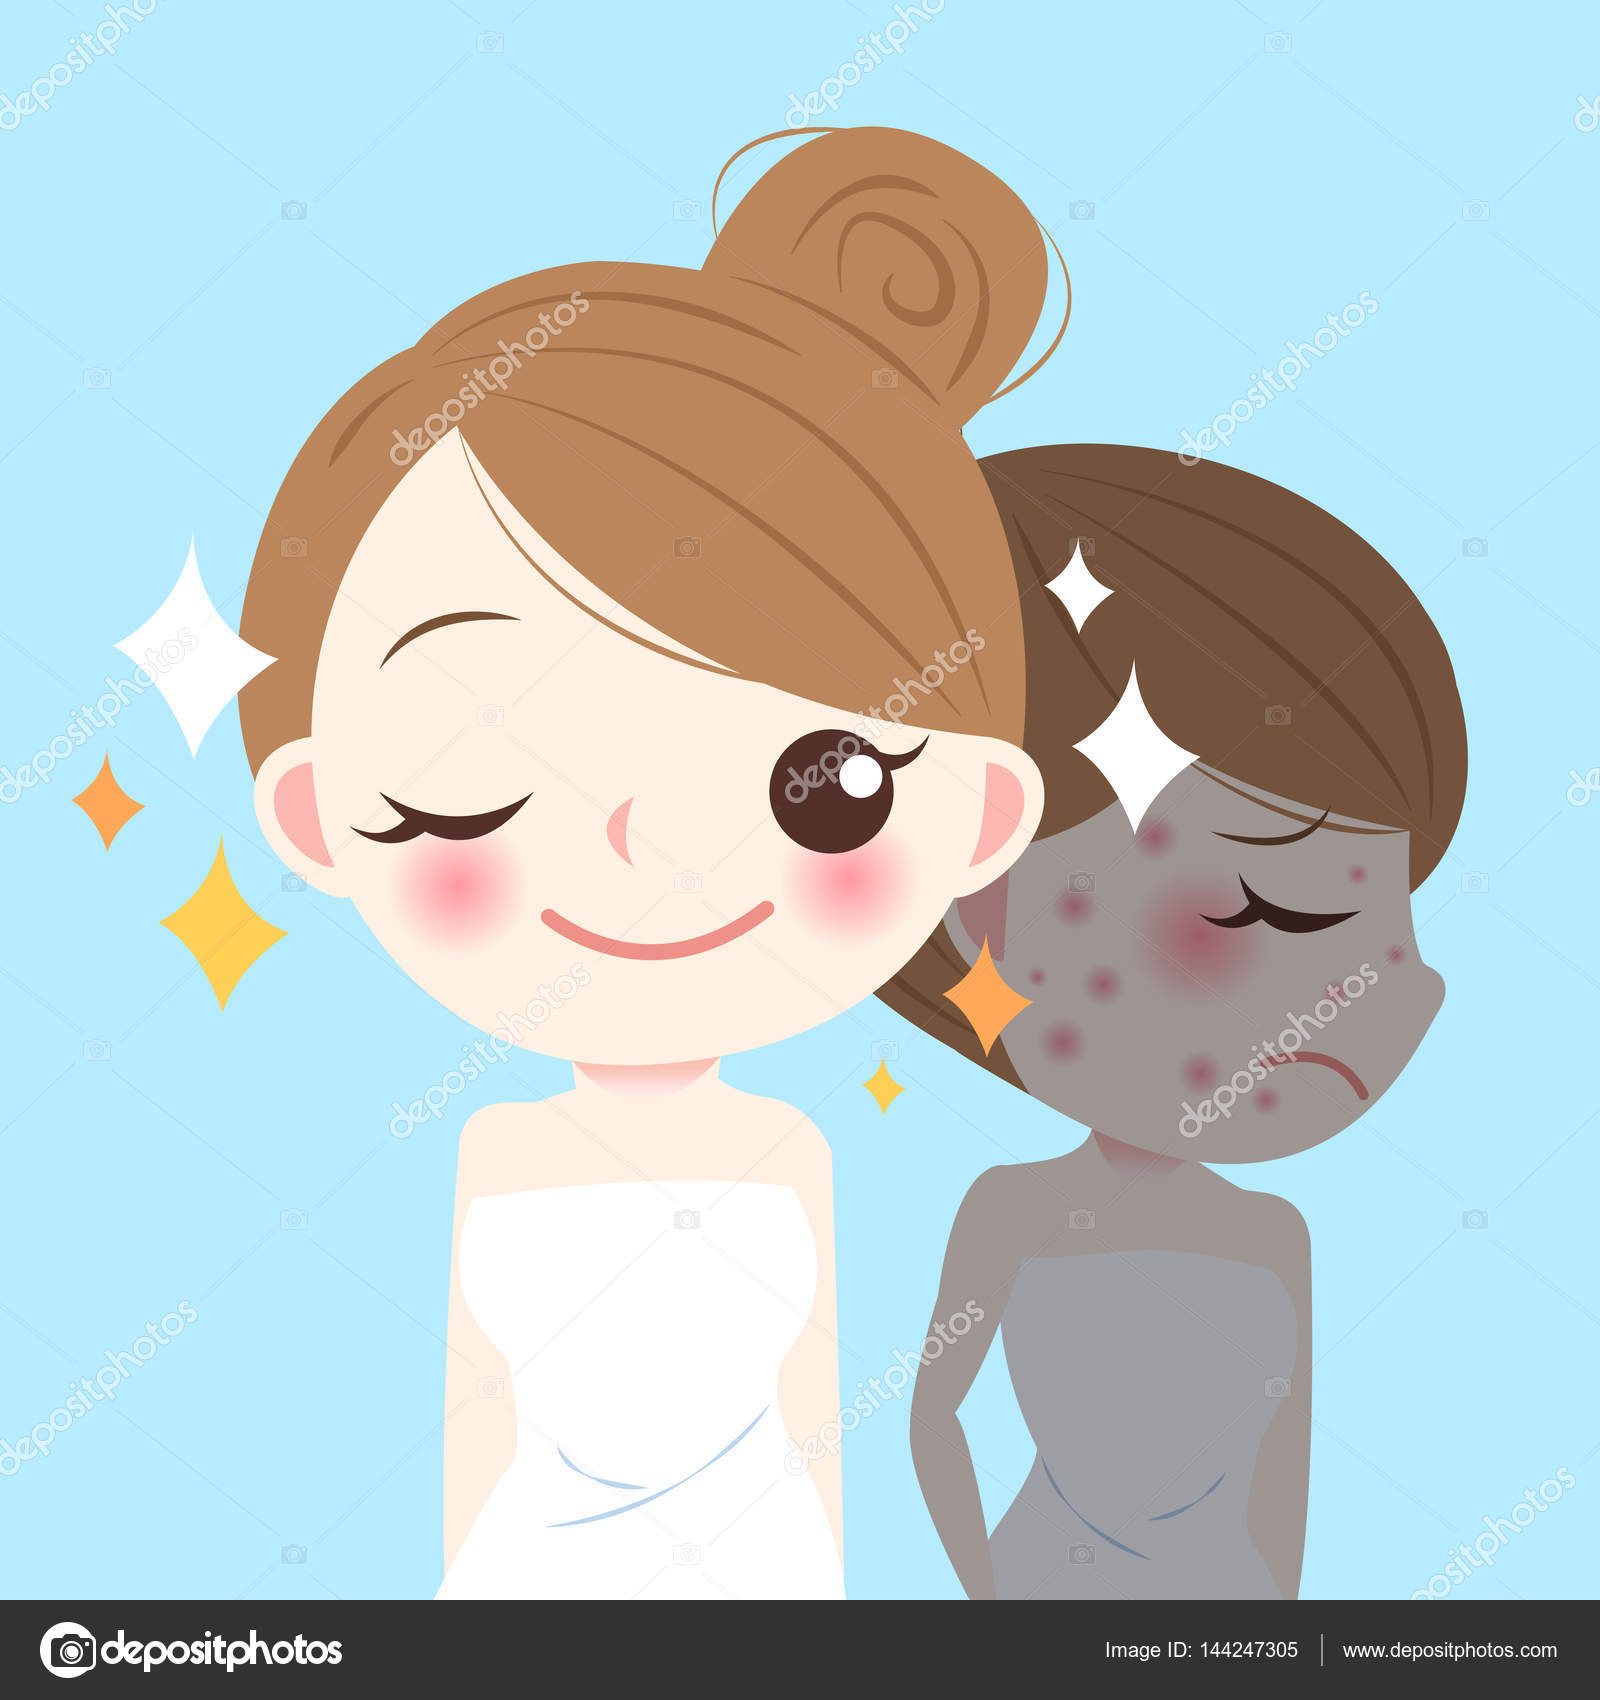 Beauty Cartoon Skincare Woman Stock Vector C Estherqueen999 144247305